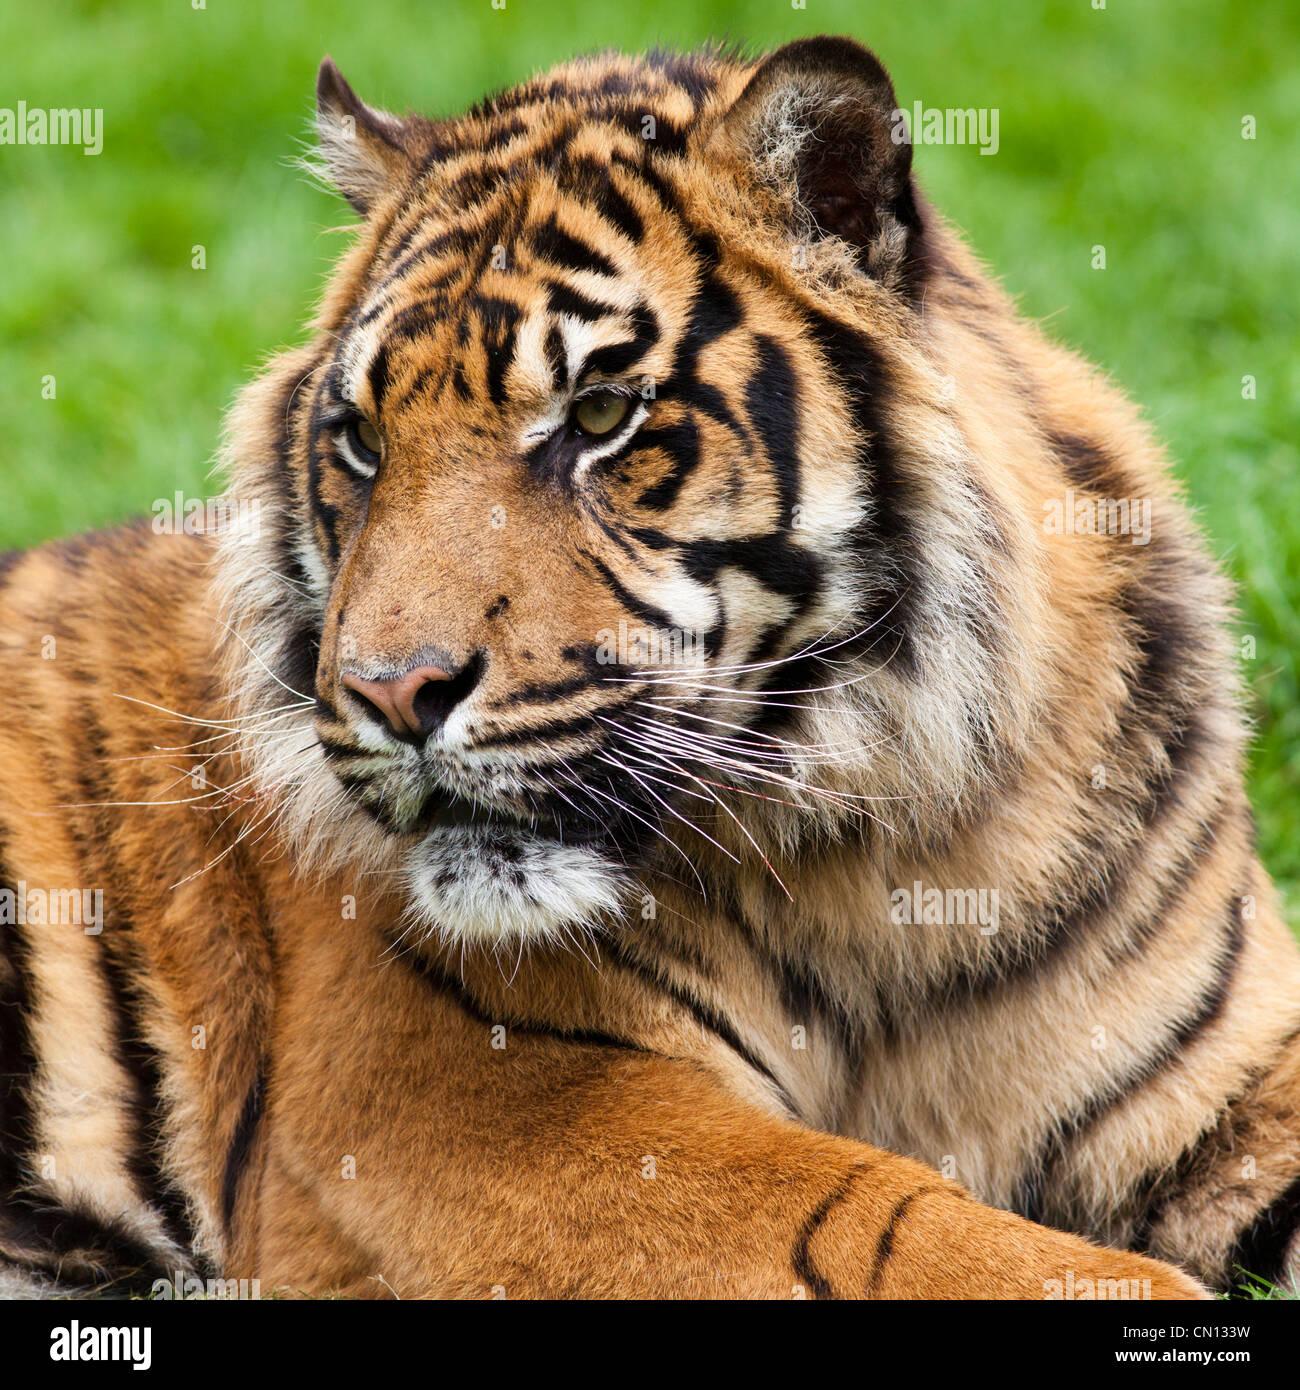 Tiger - Panthera tigris - close up ritratto Immagini Stock